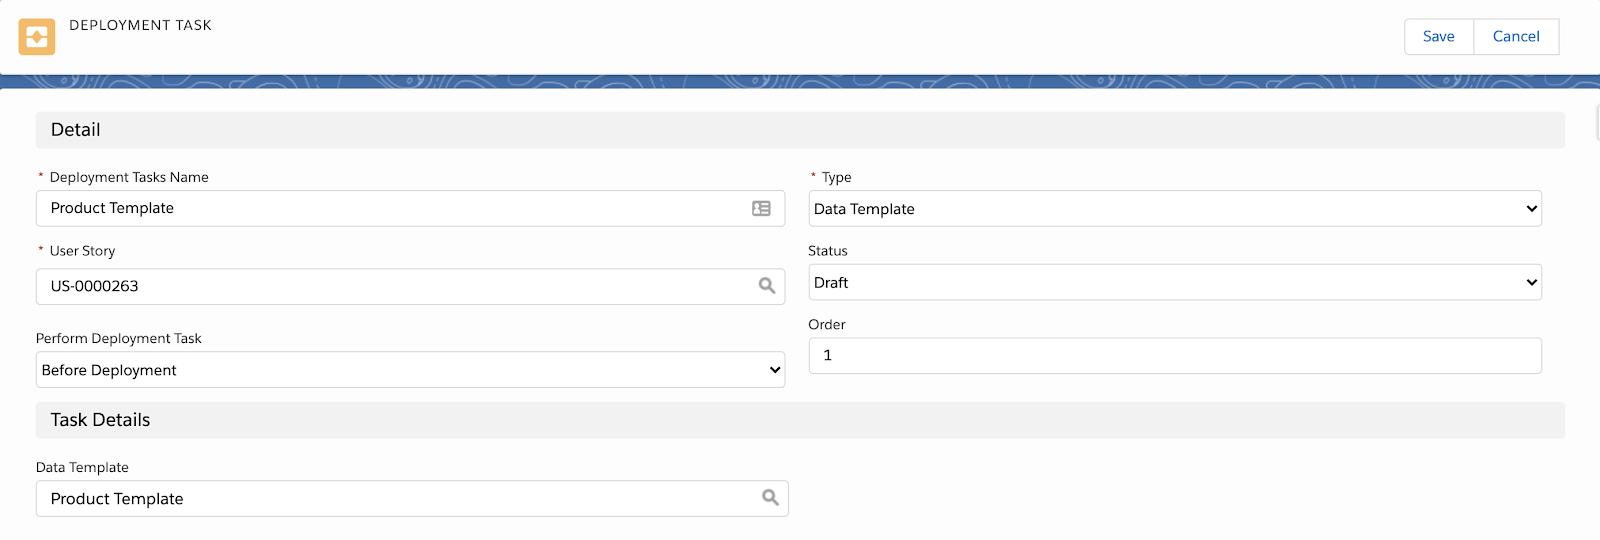 Data Template deployment task